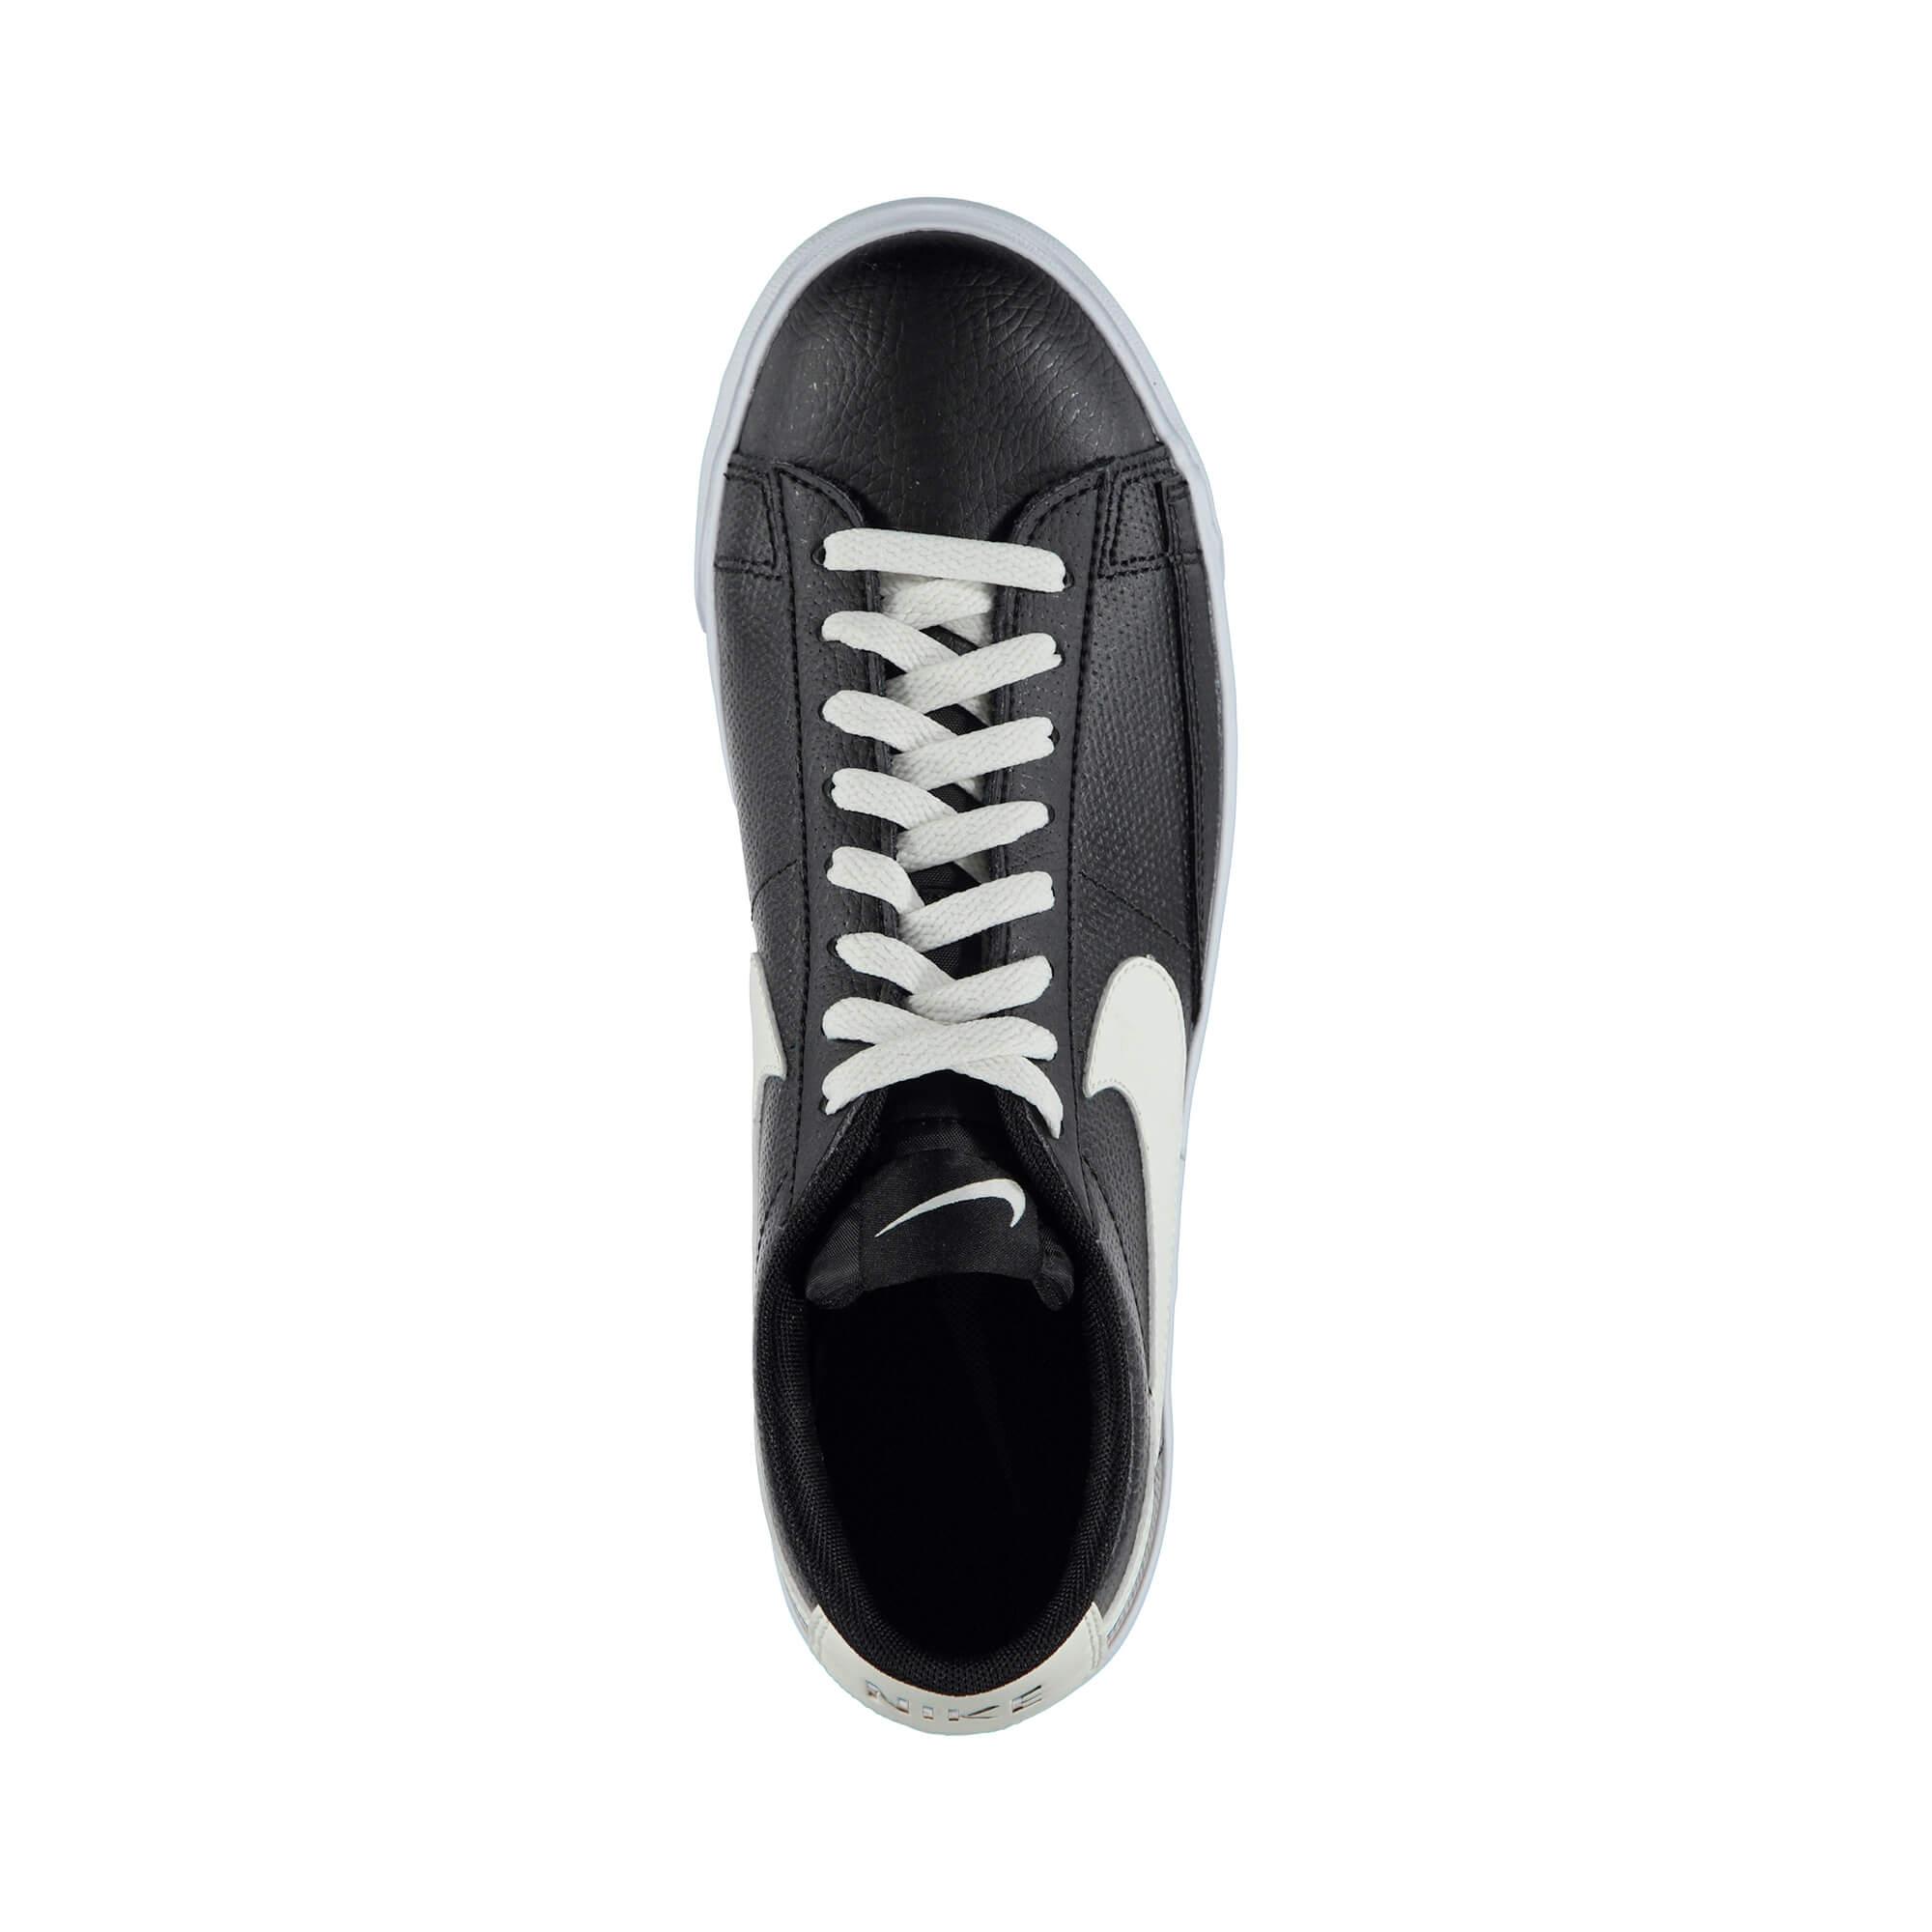 Nike Erkek Siyah Sneakers